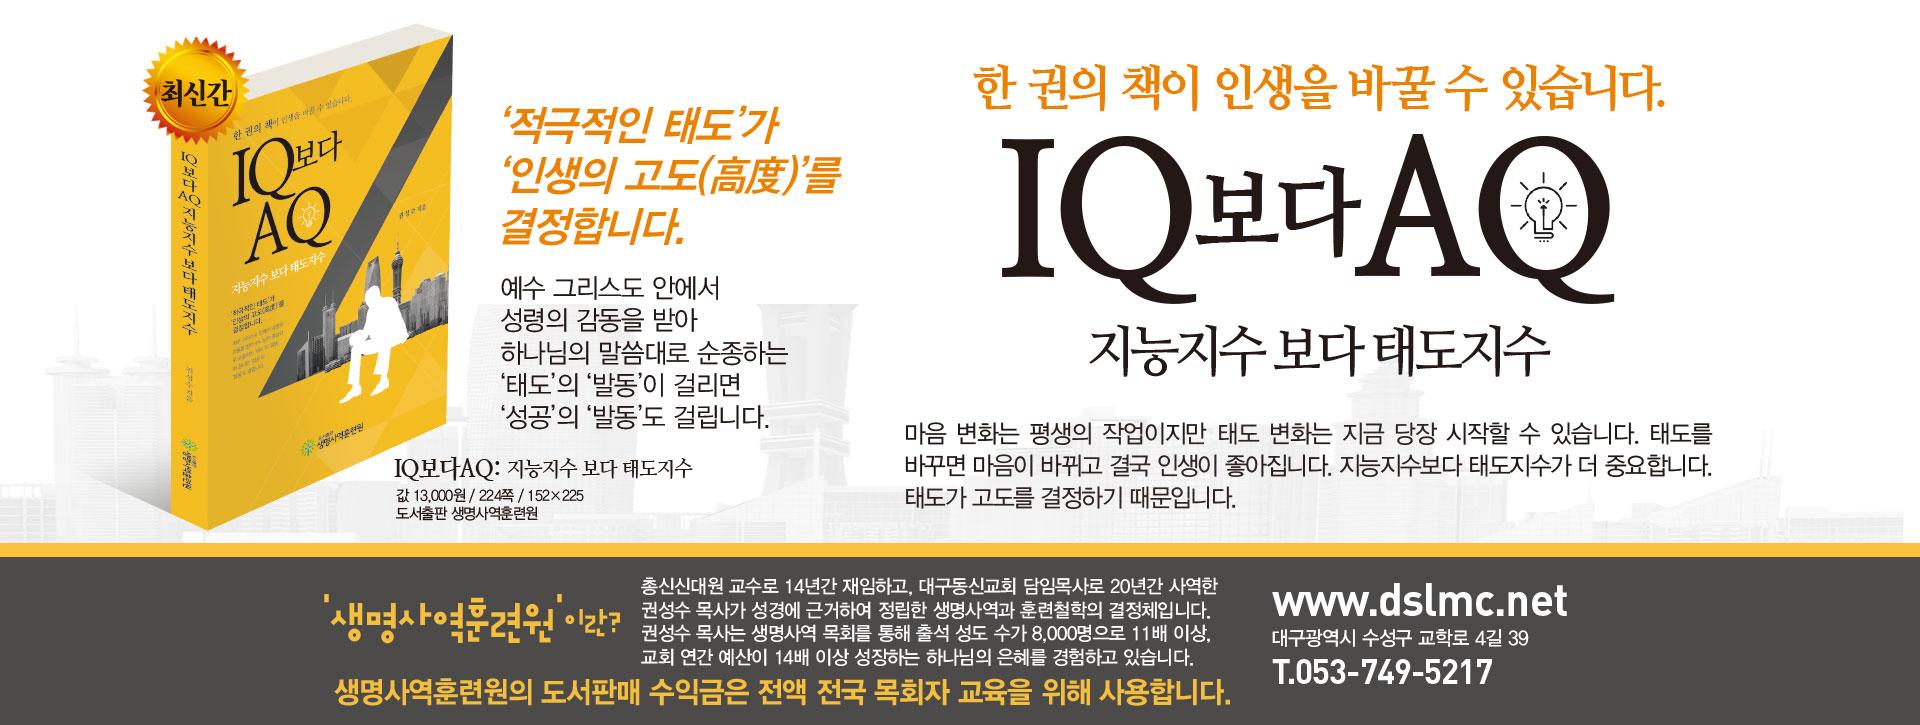 IQ-보다-AQ_1920-copy-copy.jpg